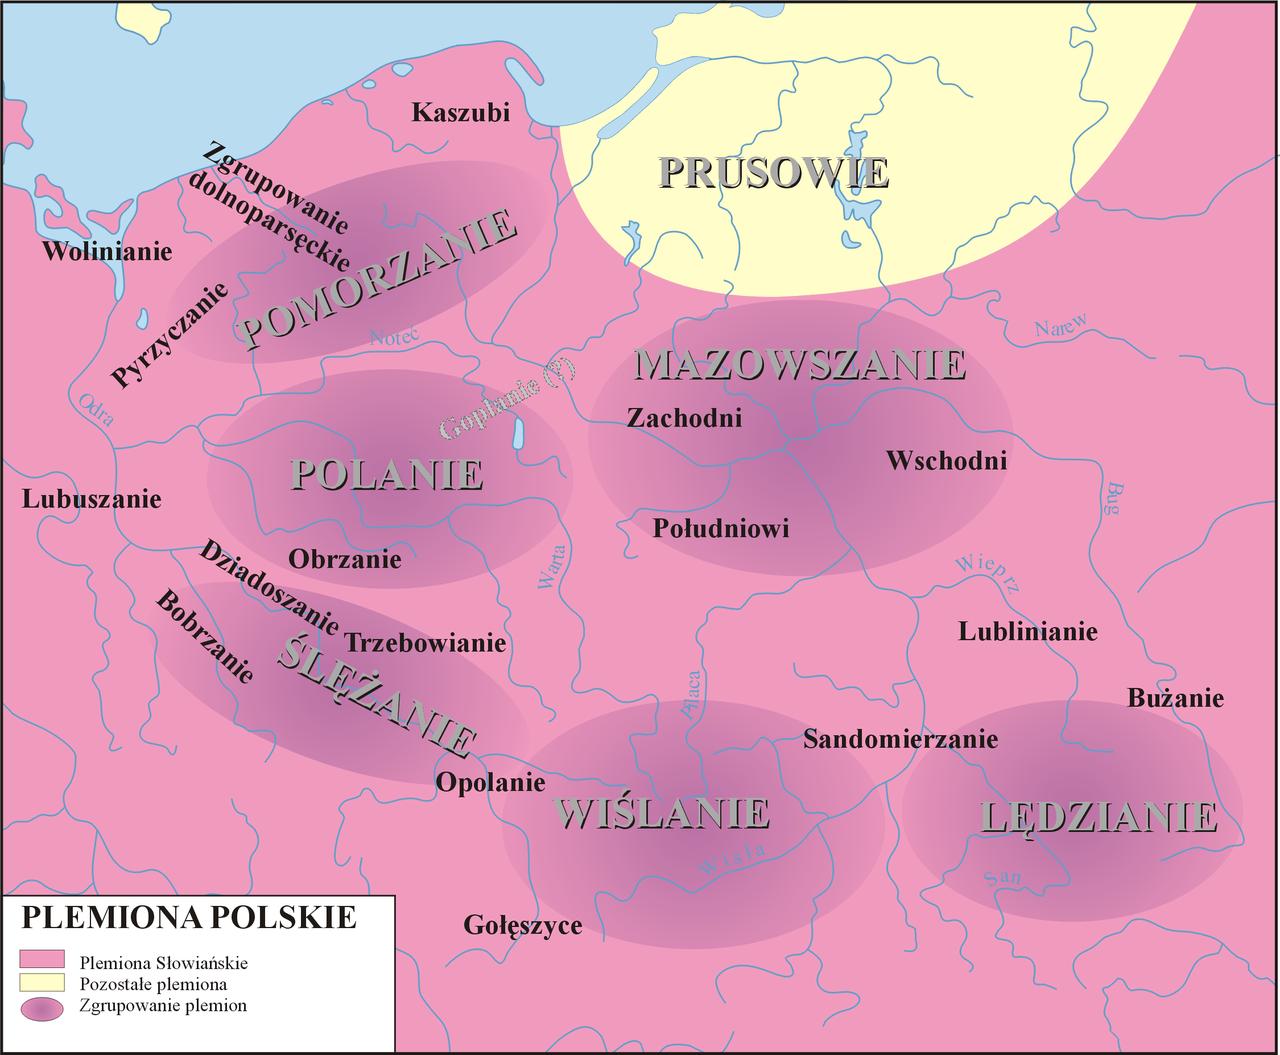 https://upload.wikimedia.org/wikipedia/commons/thumb/2/2b/Plemiona_polskie.png/1280px-Plemiona_polskie.png